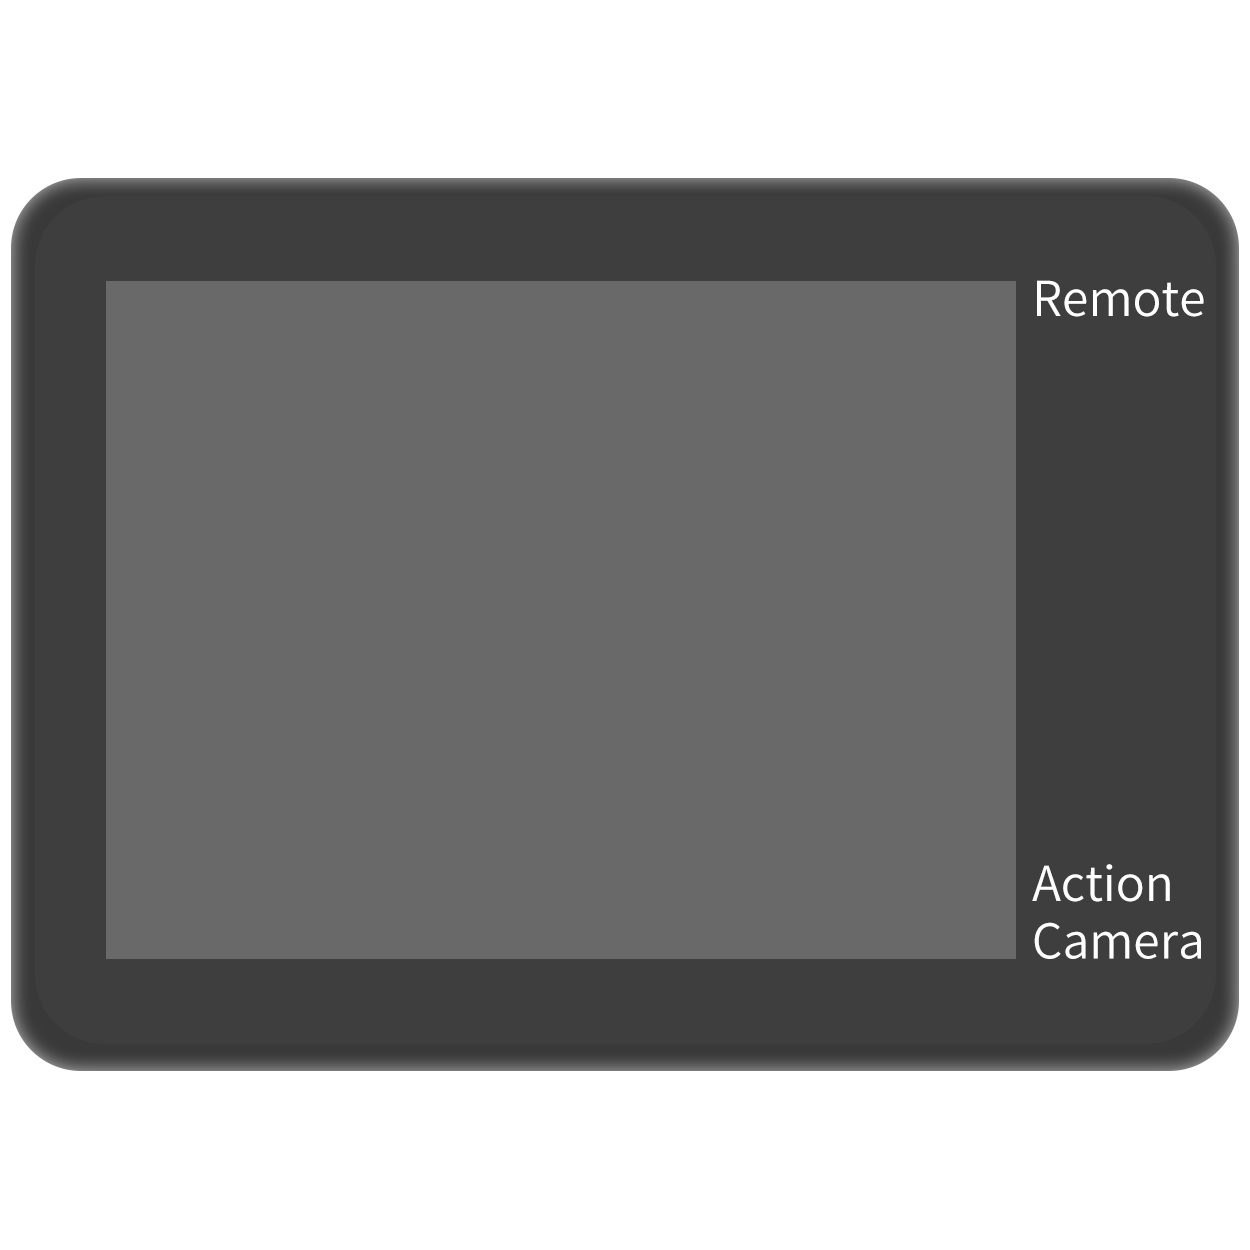 Sport Action camera drift 4K anti-shake wireless micro ultra